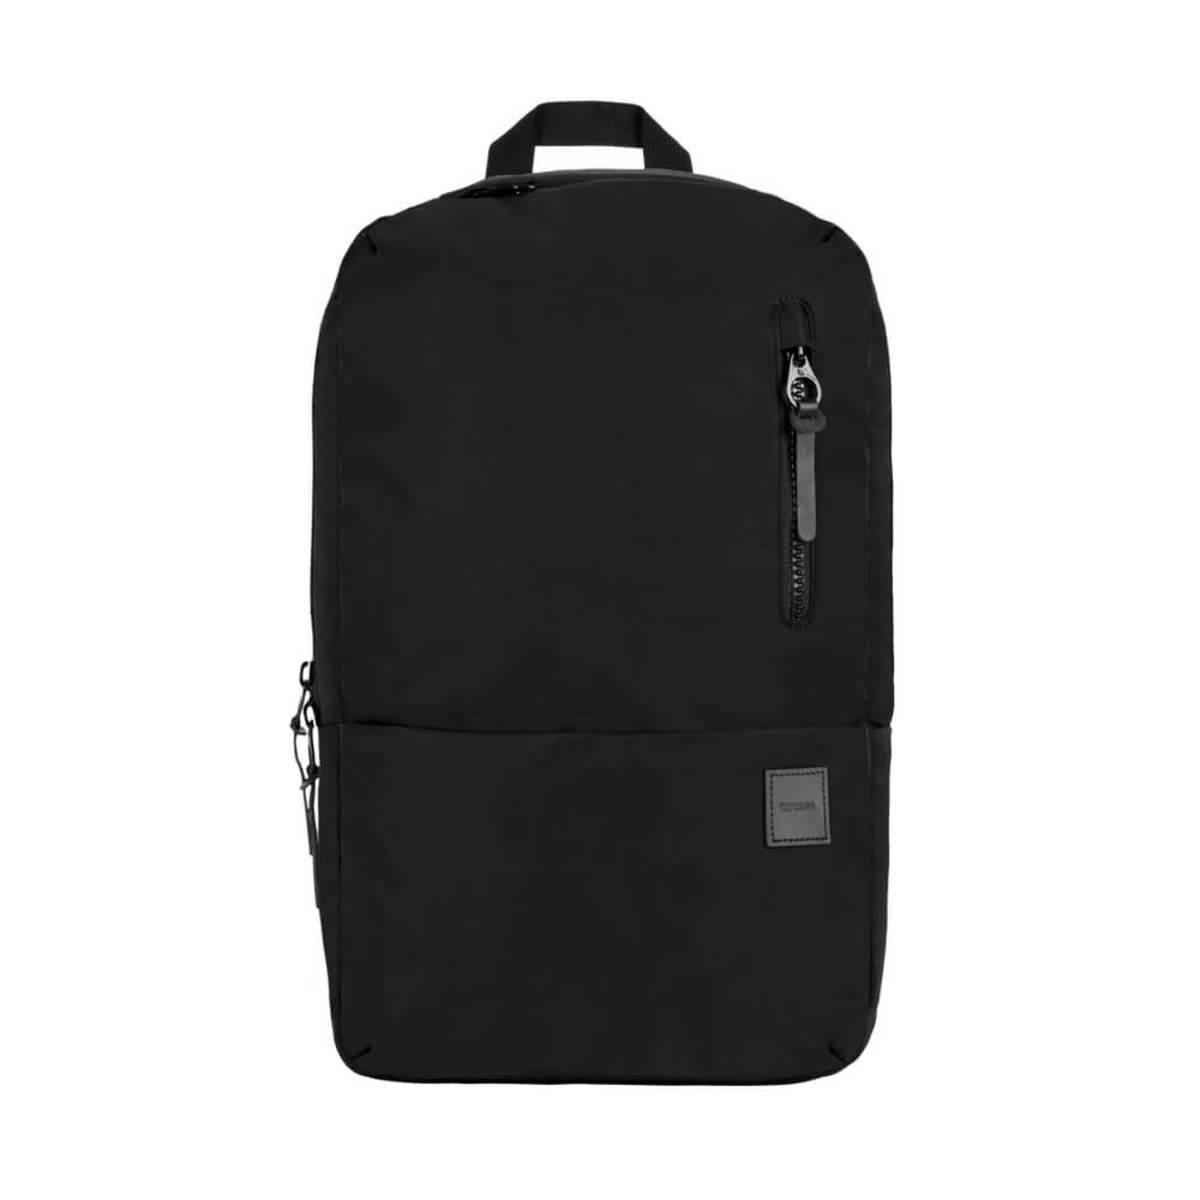 "INCO100516 Black 15"" Compass W/Flight Nylon Backpack"